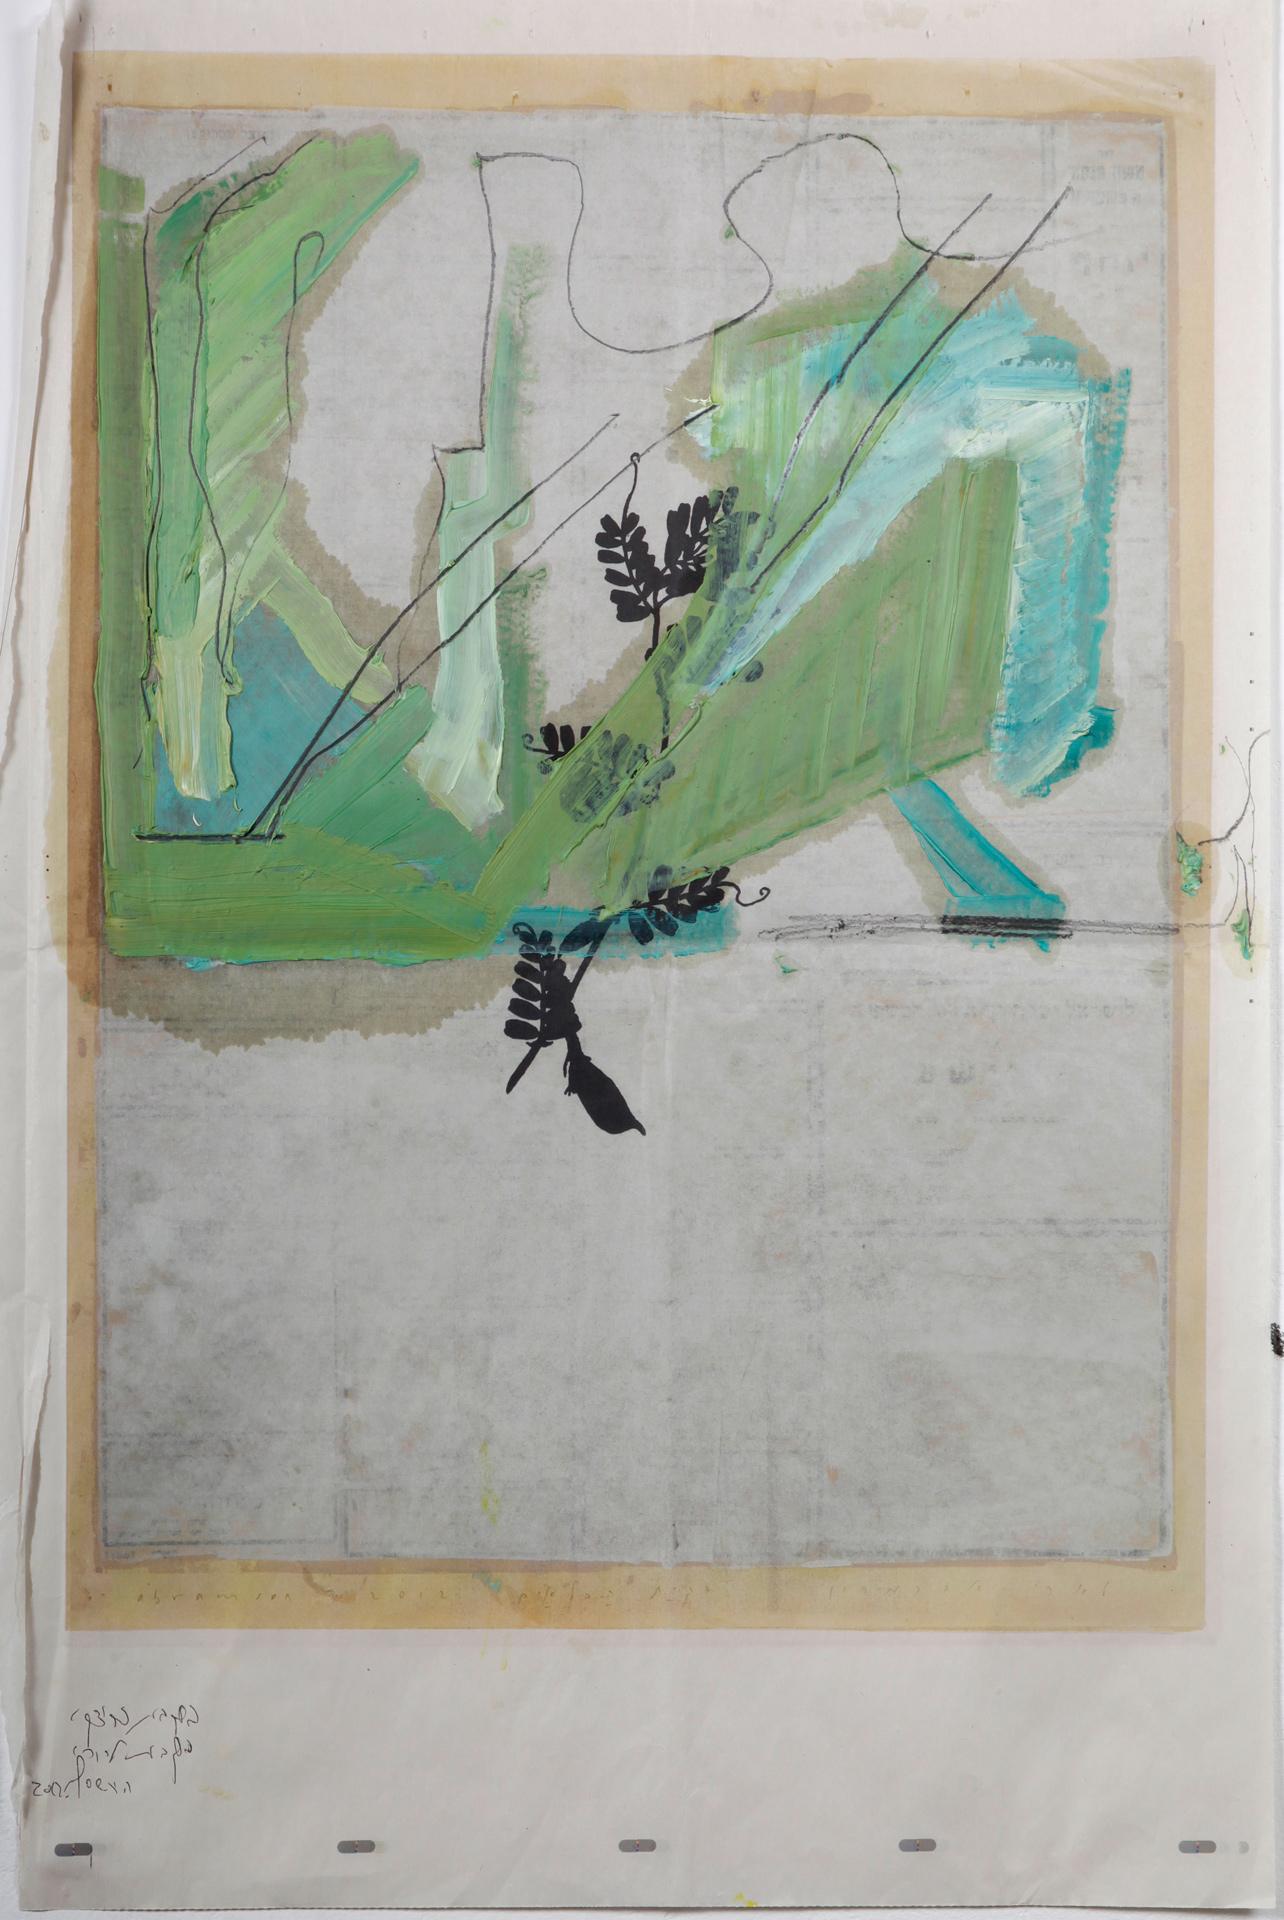 Larizari 13, Oil on readymade, 60X40 cm, 2013